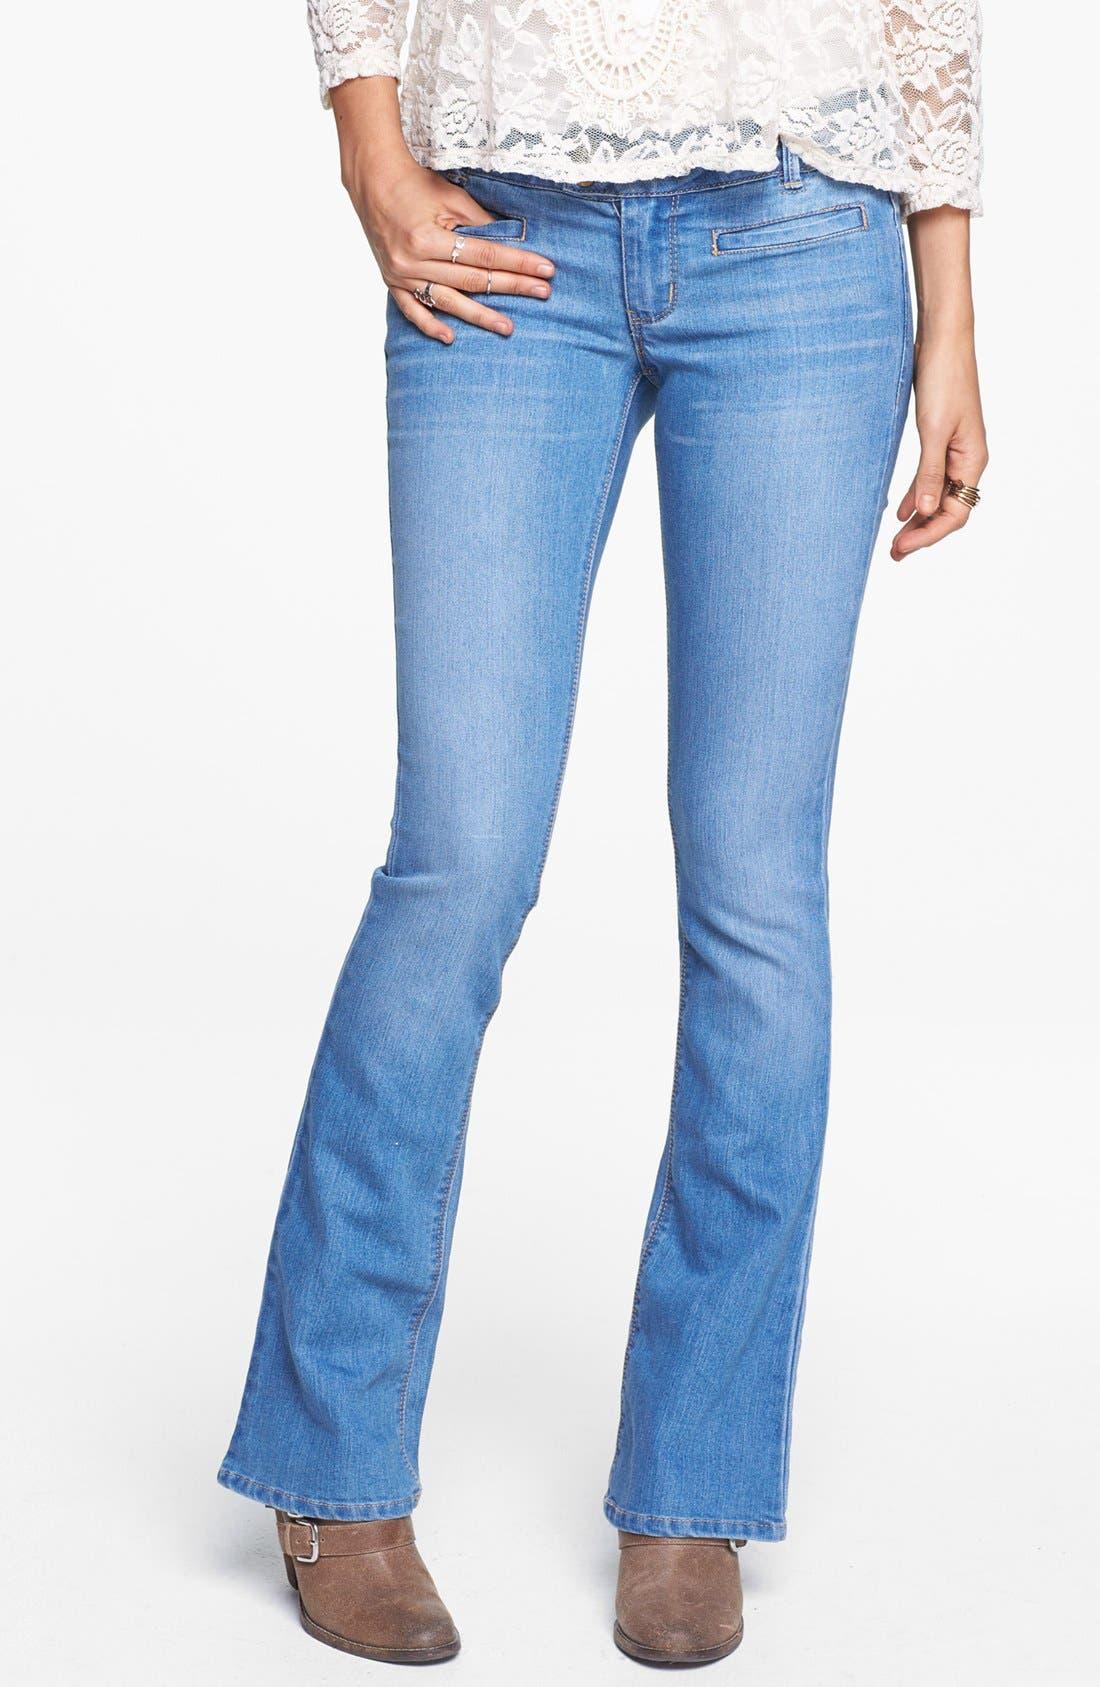 Main Image - Jolt Welt Pocket Bootcut Jeans (Light) (Juniors) (Online Only)